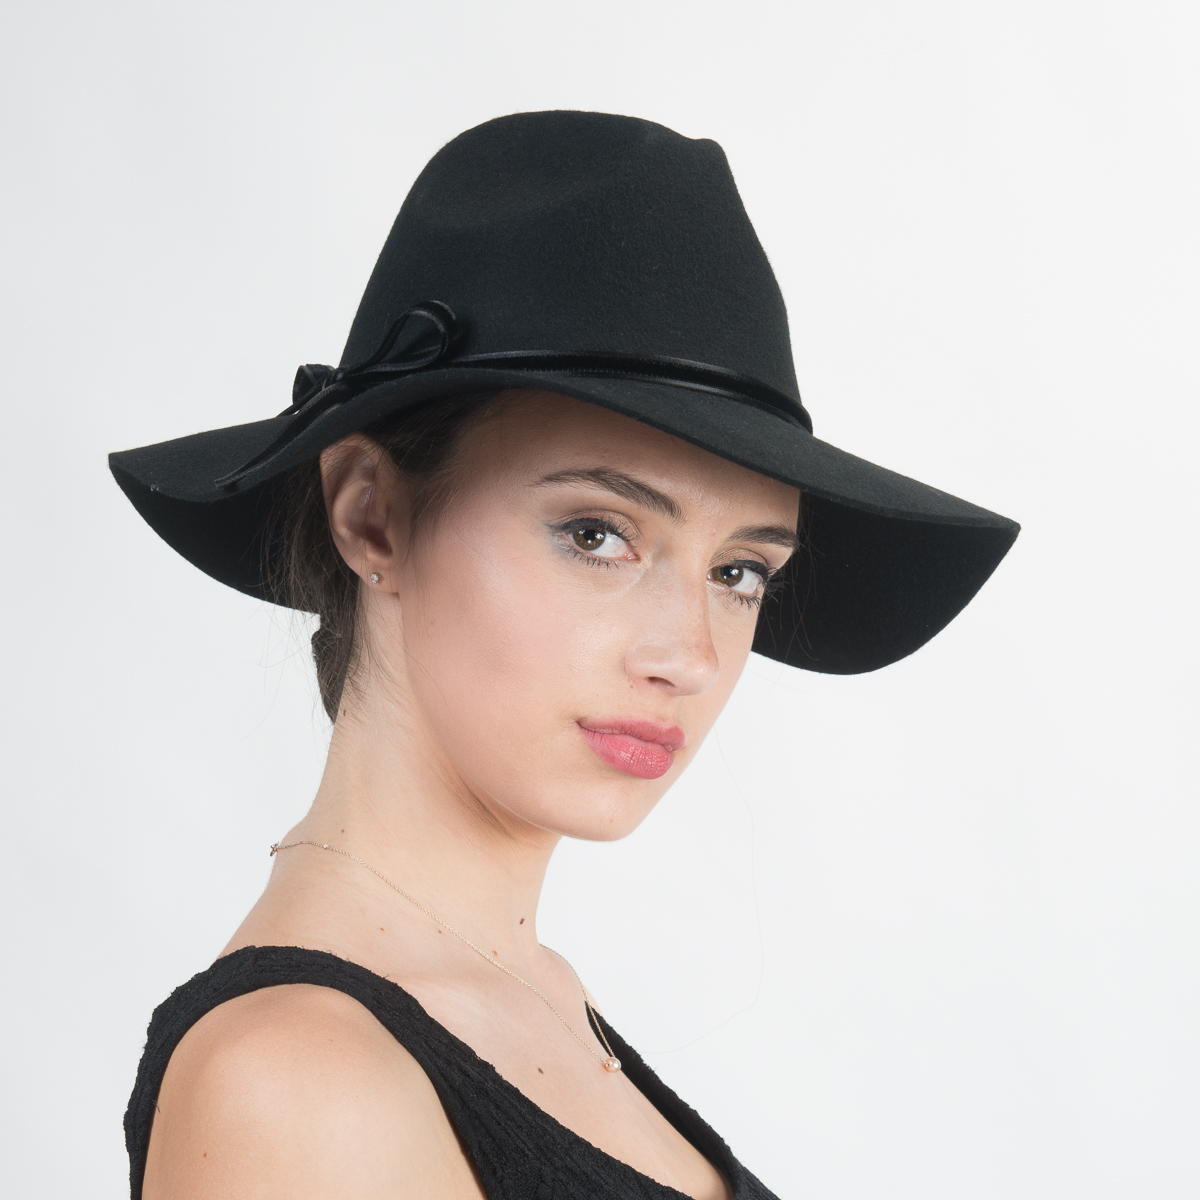 029a3cbc966173 Black Wool Felt Floppy Brim Fedora Hats-400777-BK- Sun Yorkos | KaKyCo  Accessories